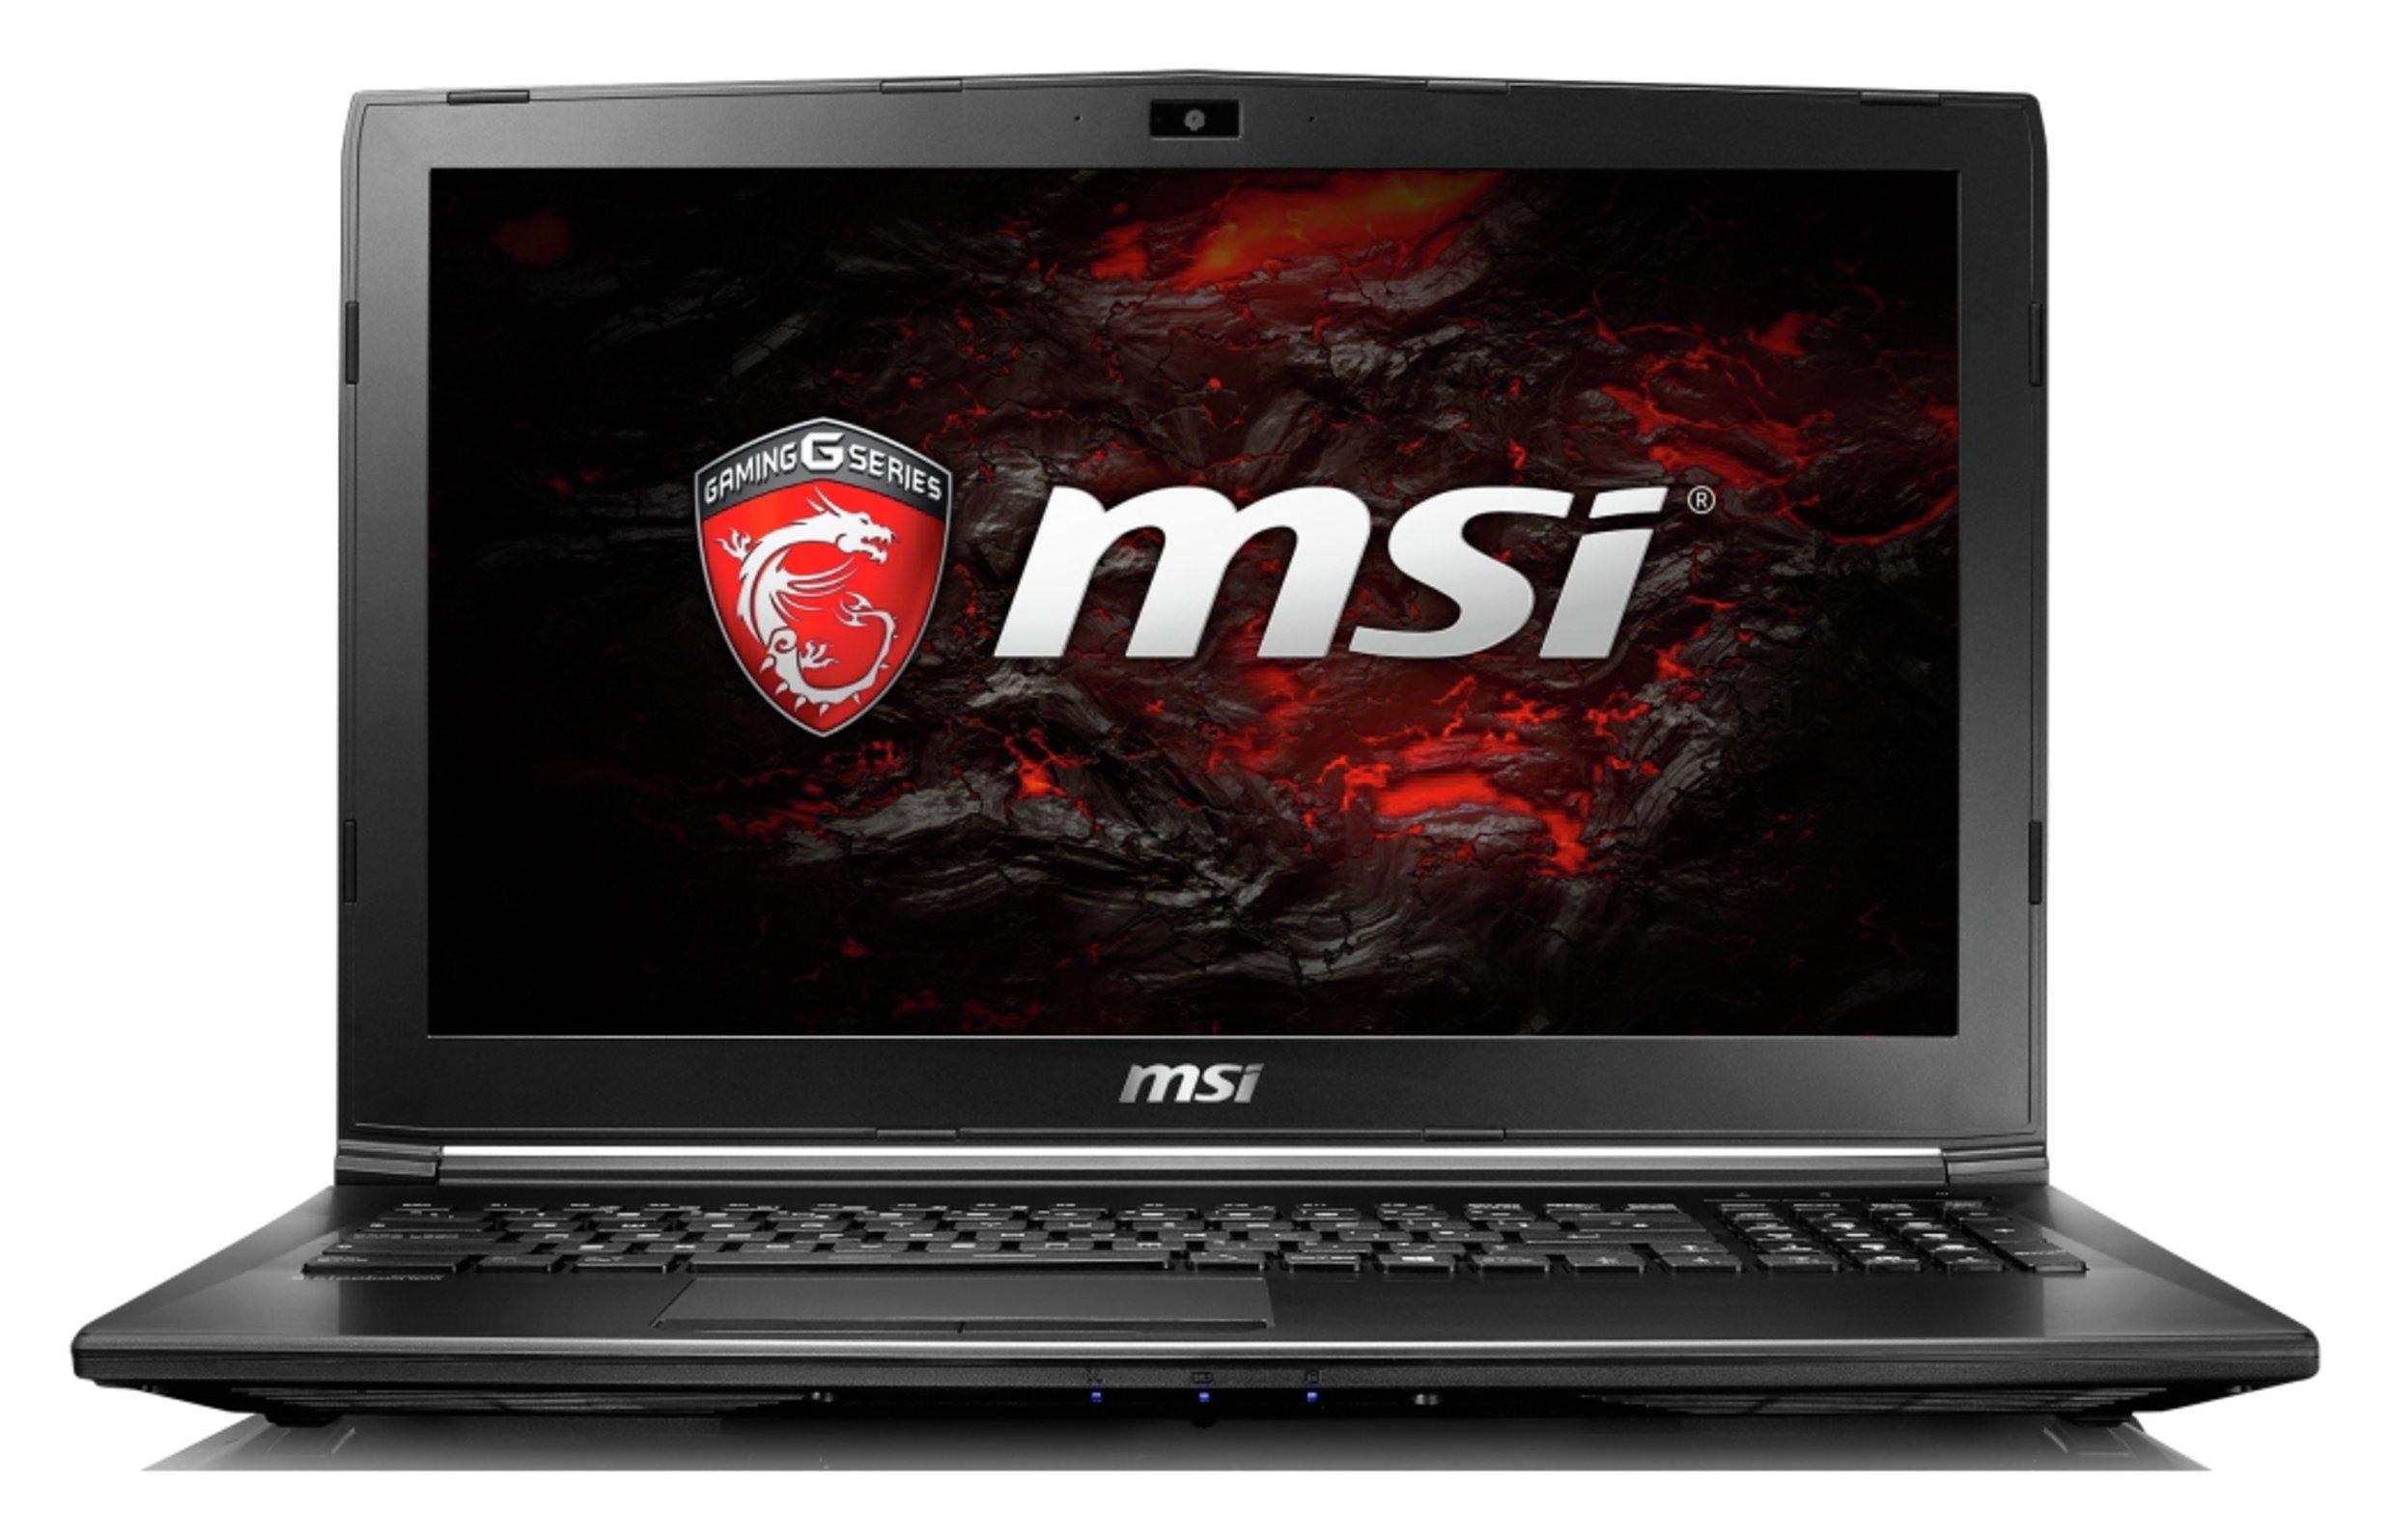 Image of MSI i5 15.6 In 8GB 1TB GTX1050 Gaming Laptop - Black.